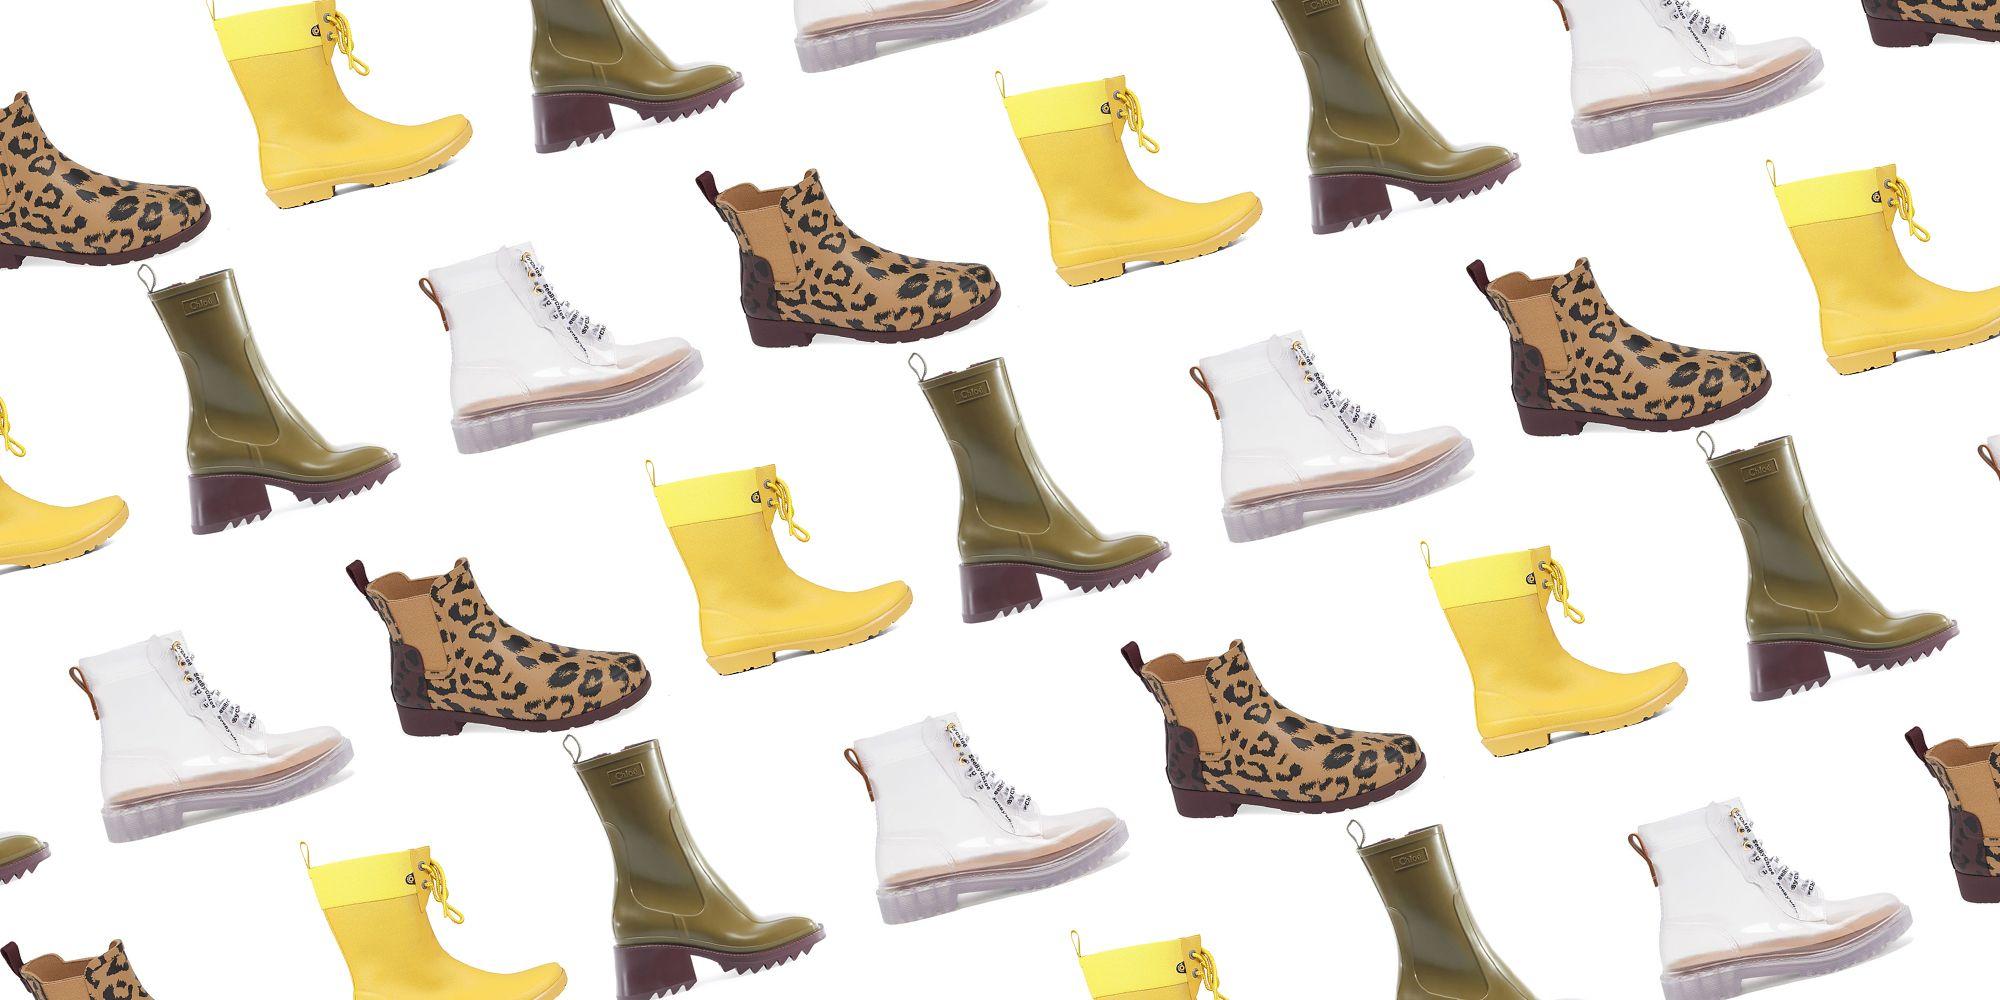 online rainy shoes for ladies